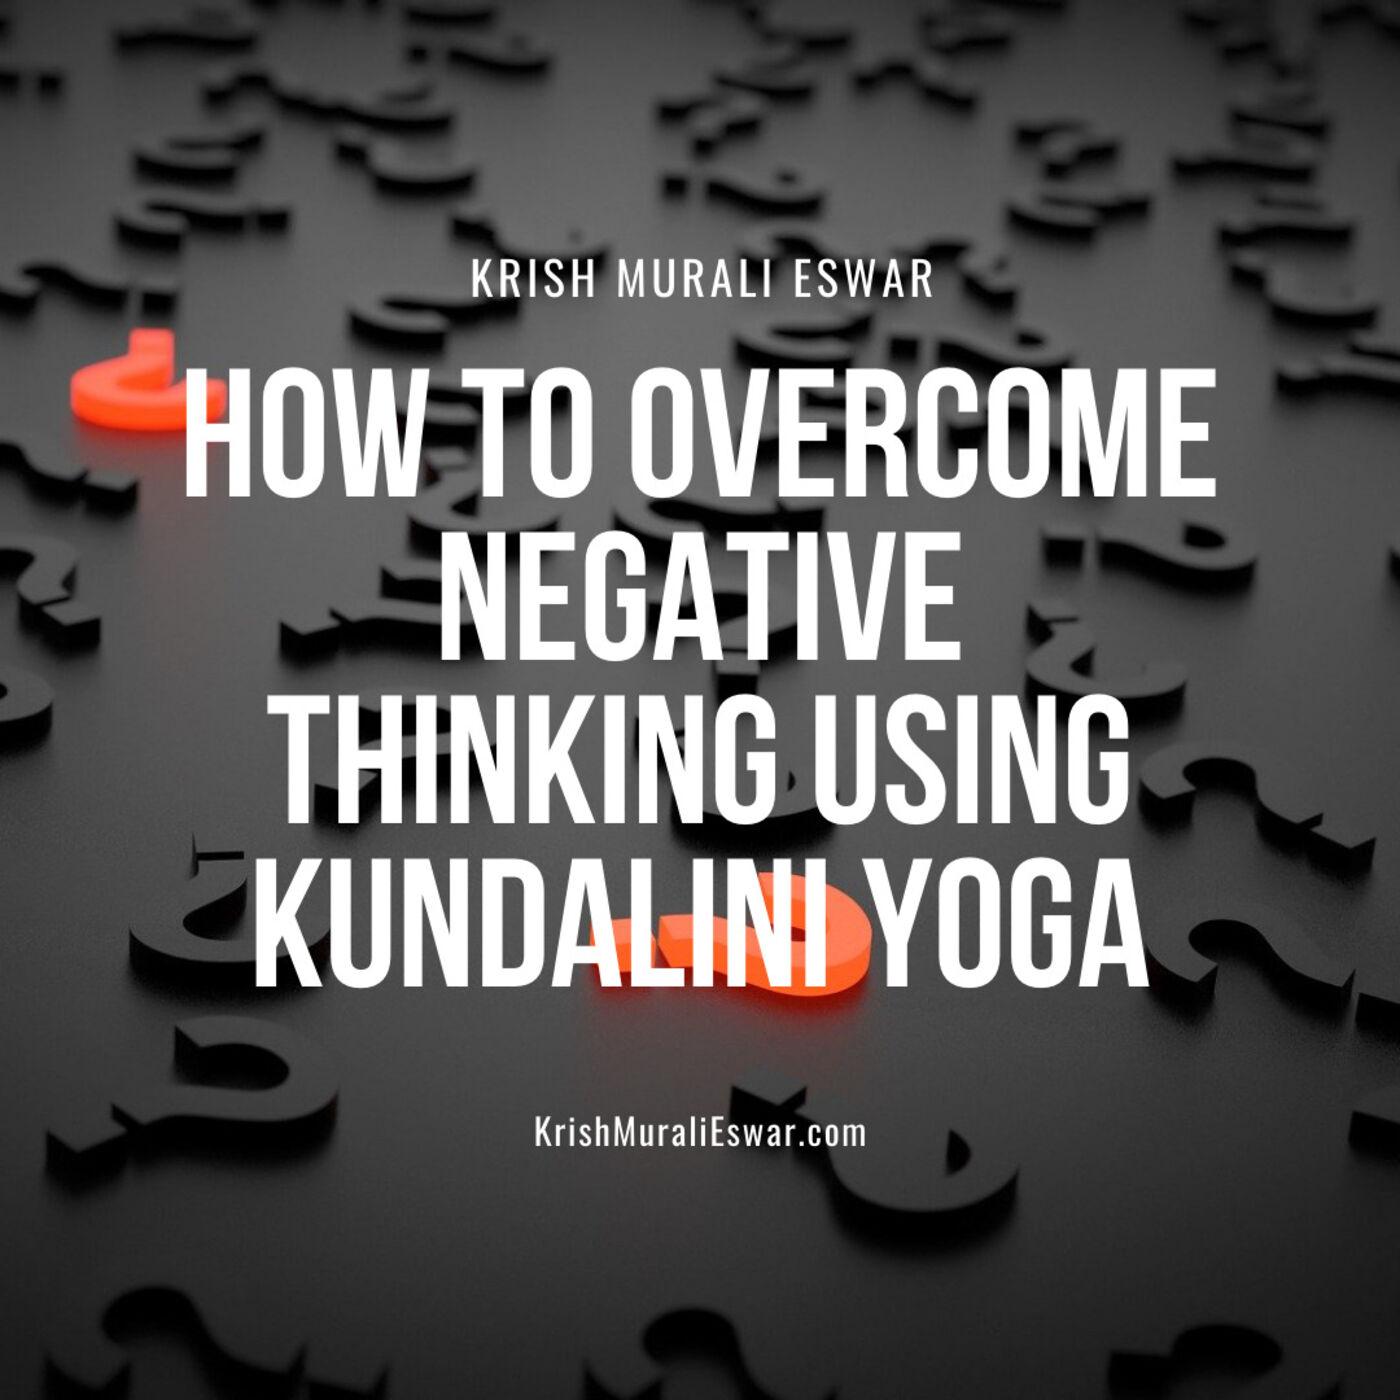 101 How to Overcome Negative Thinking using Kundalini Yoga